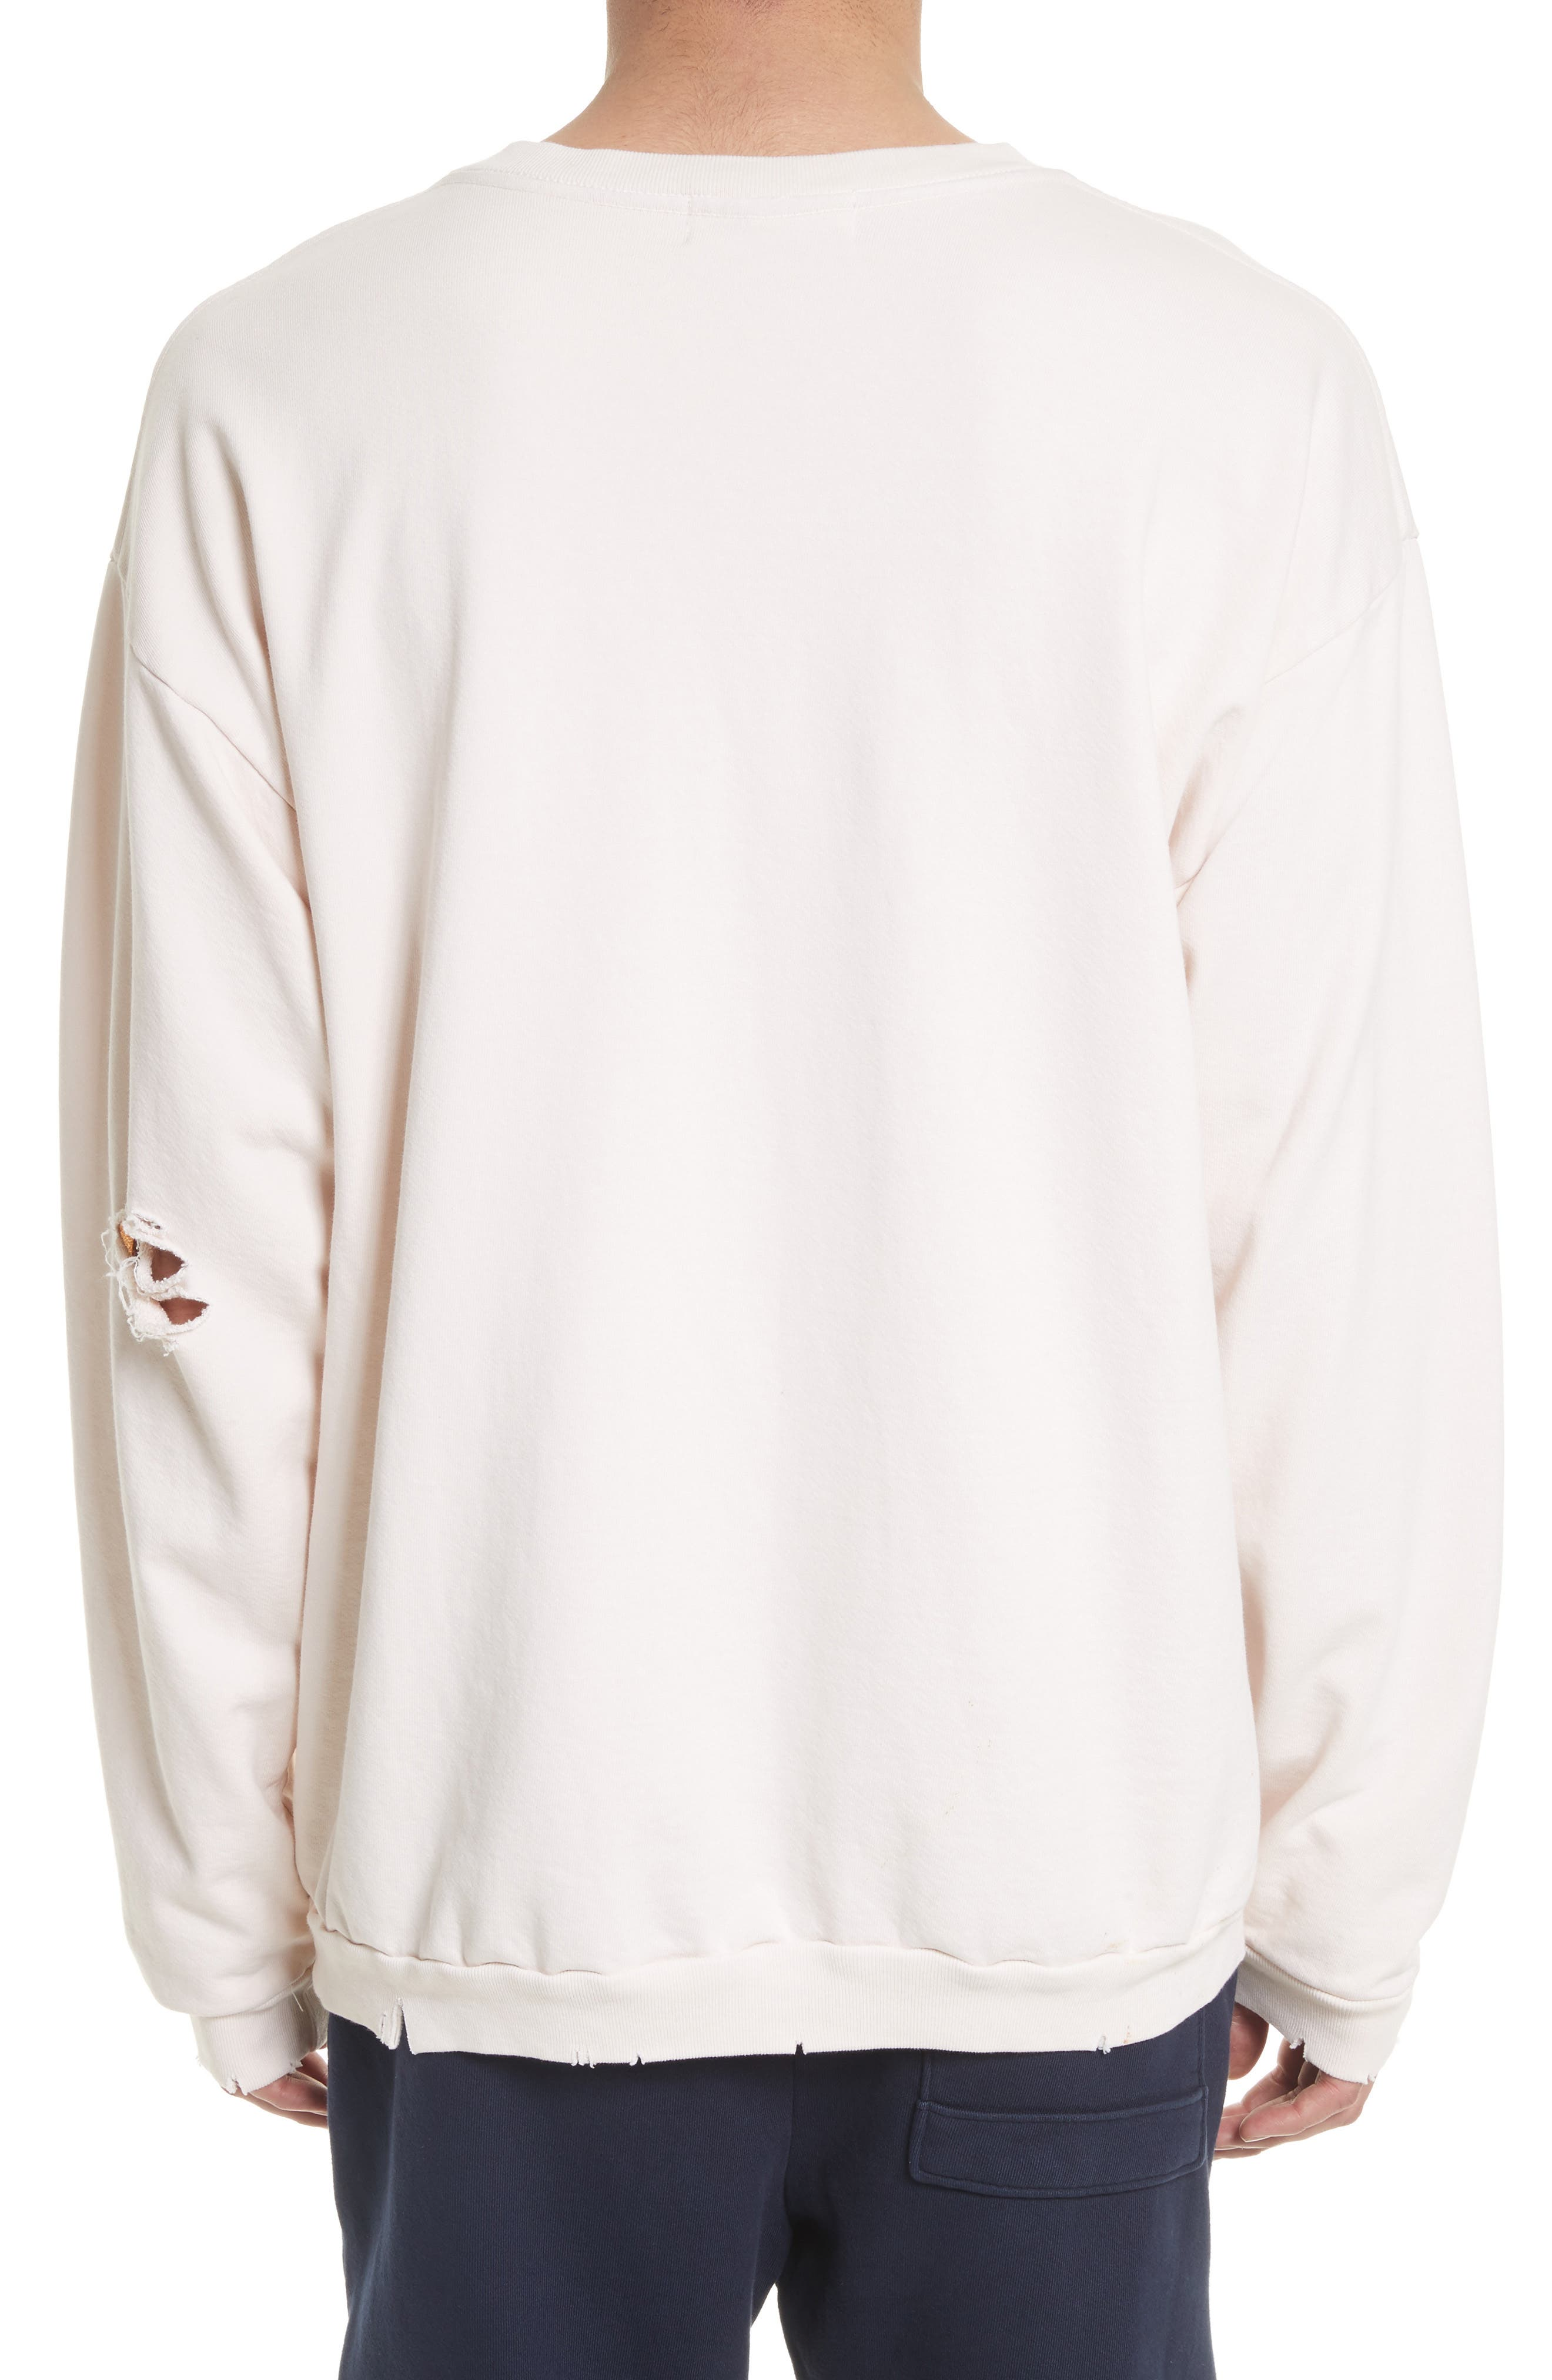 Norton Sweatshirt,                             Alternate thumbnail 4, color,